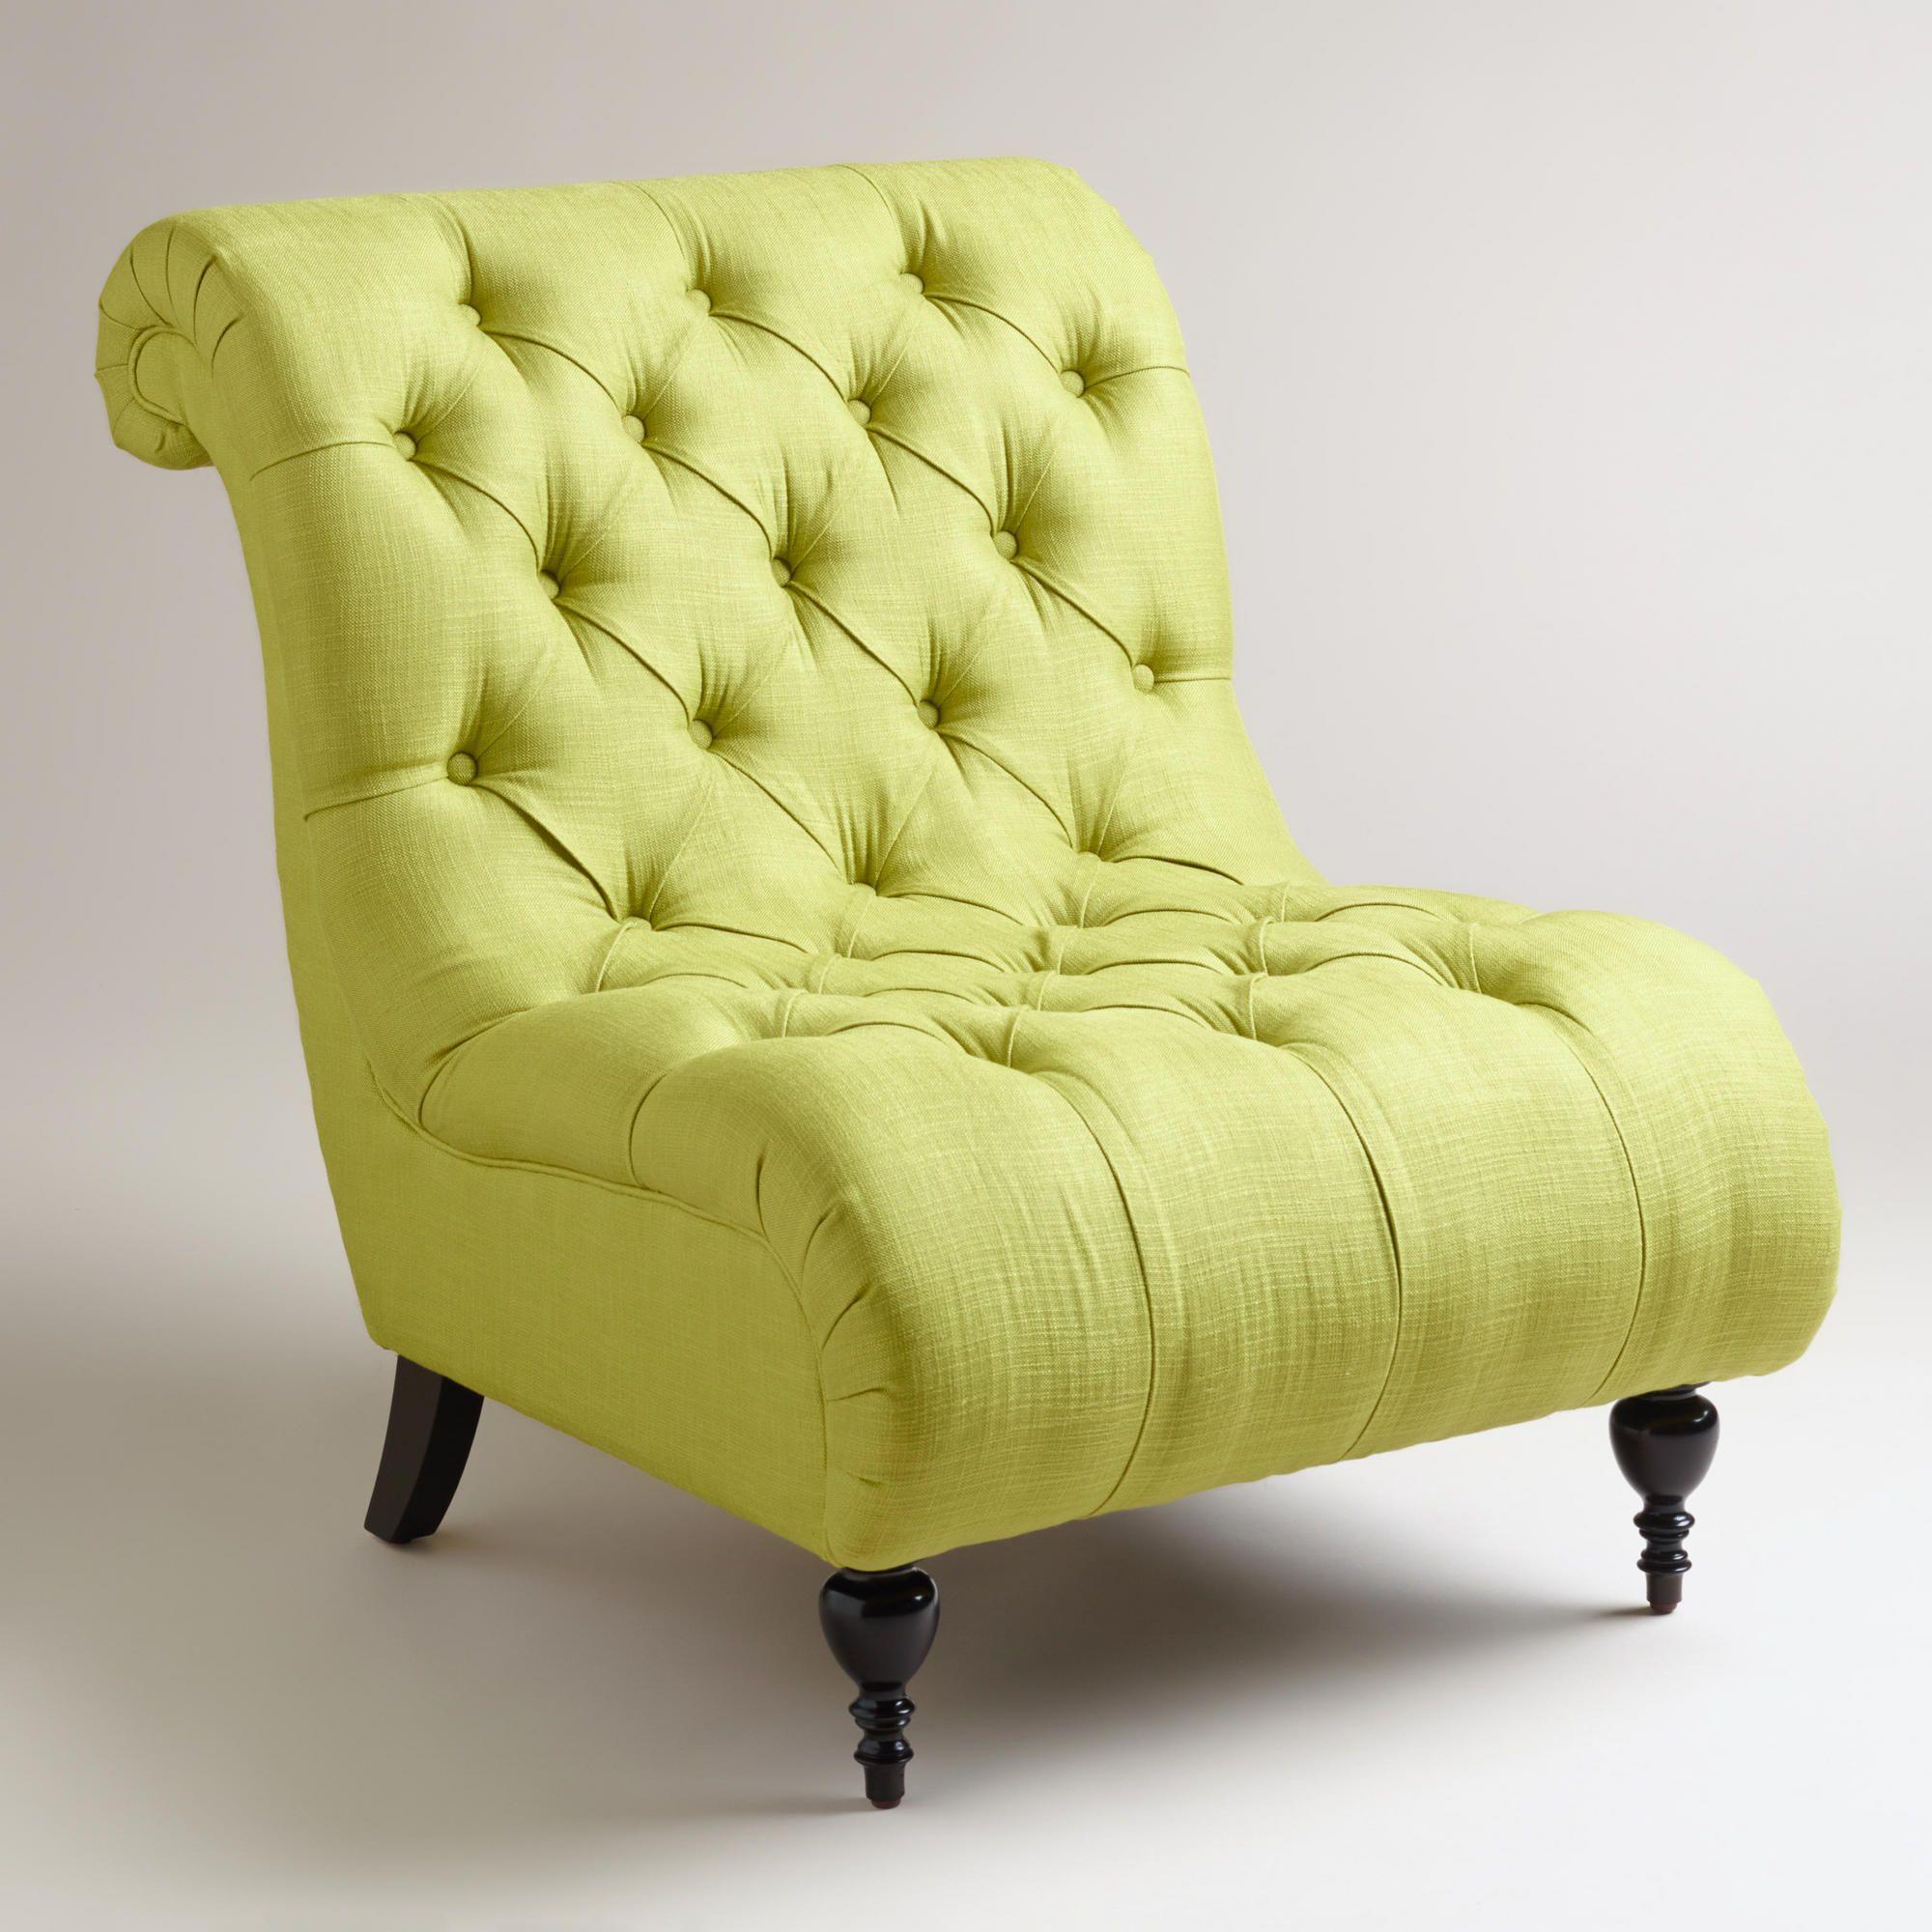 Merveilleux Tufted Slipper Chair